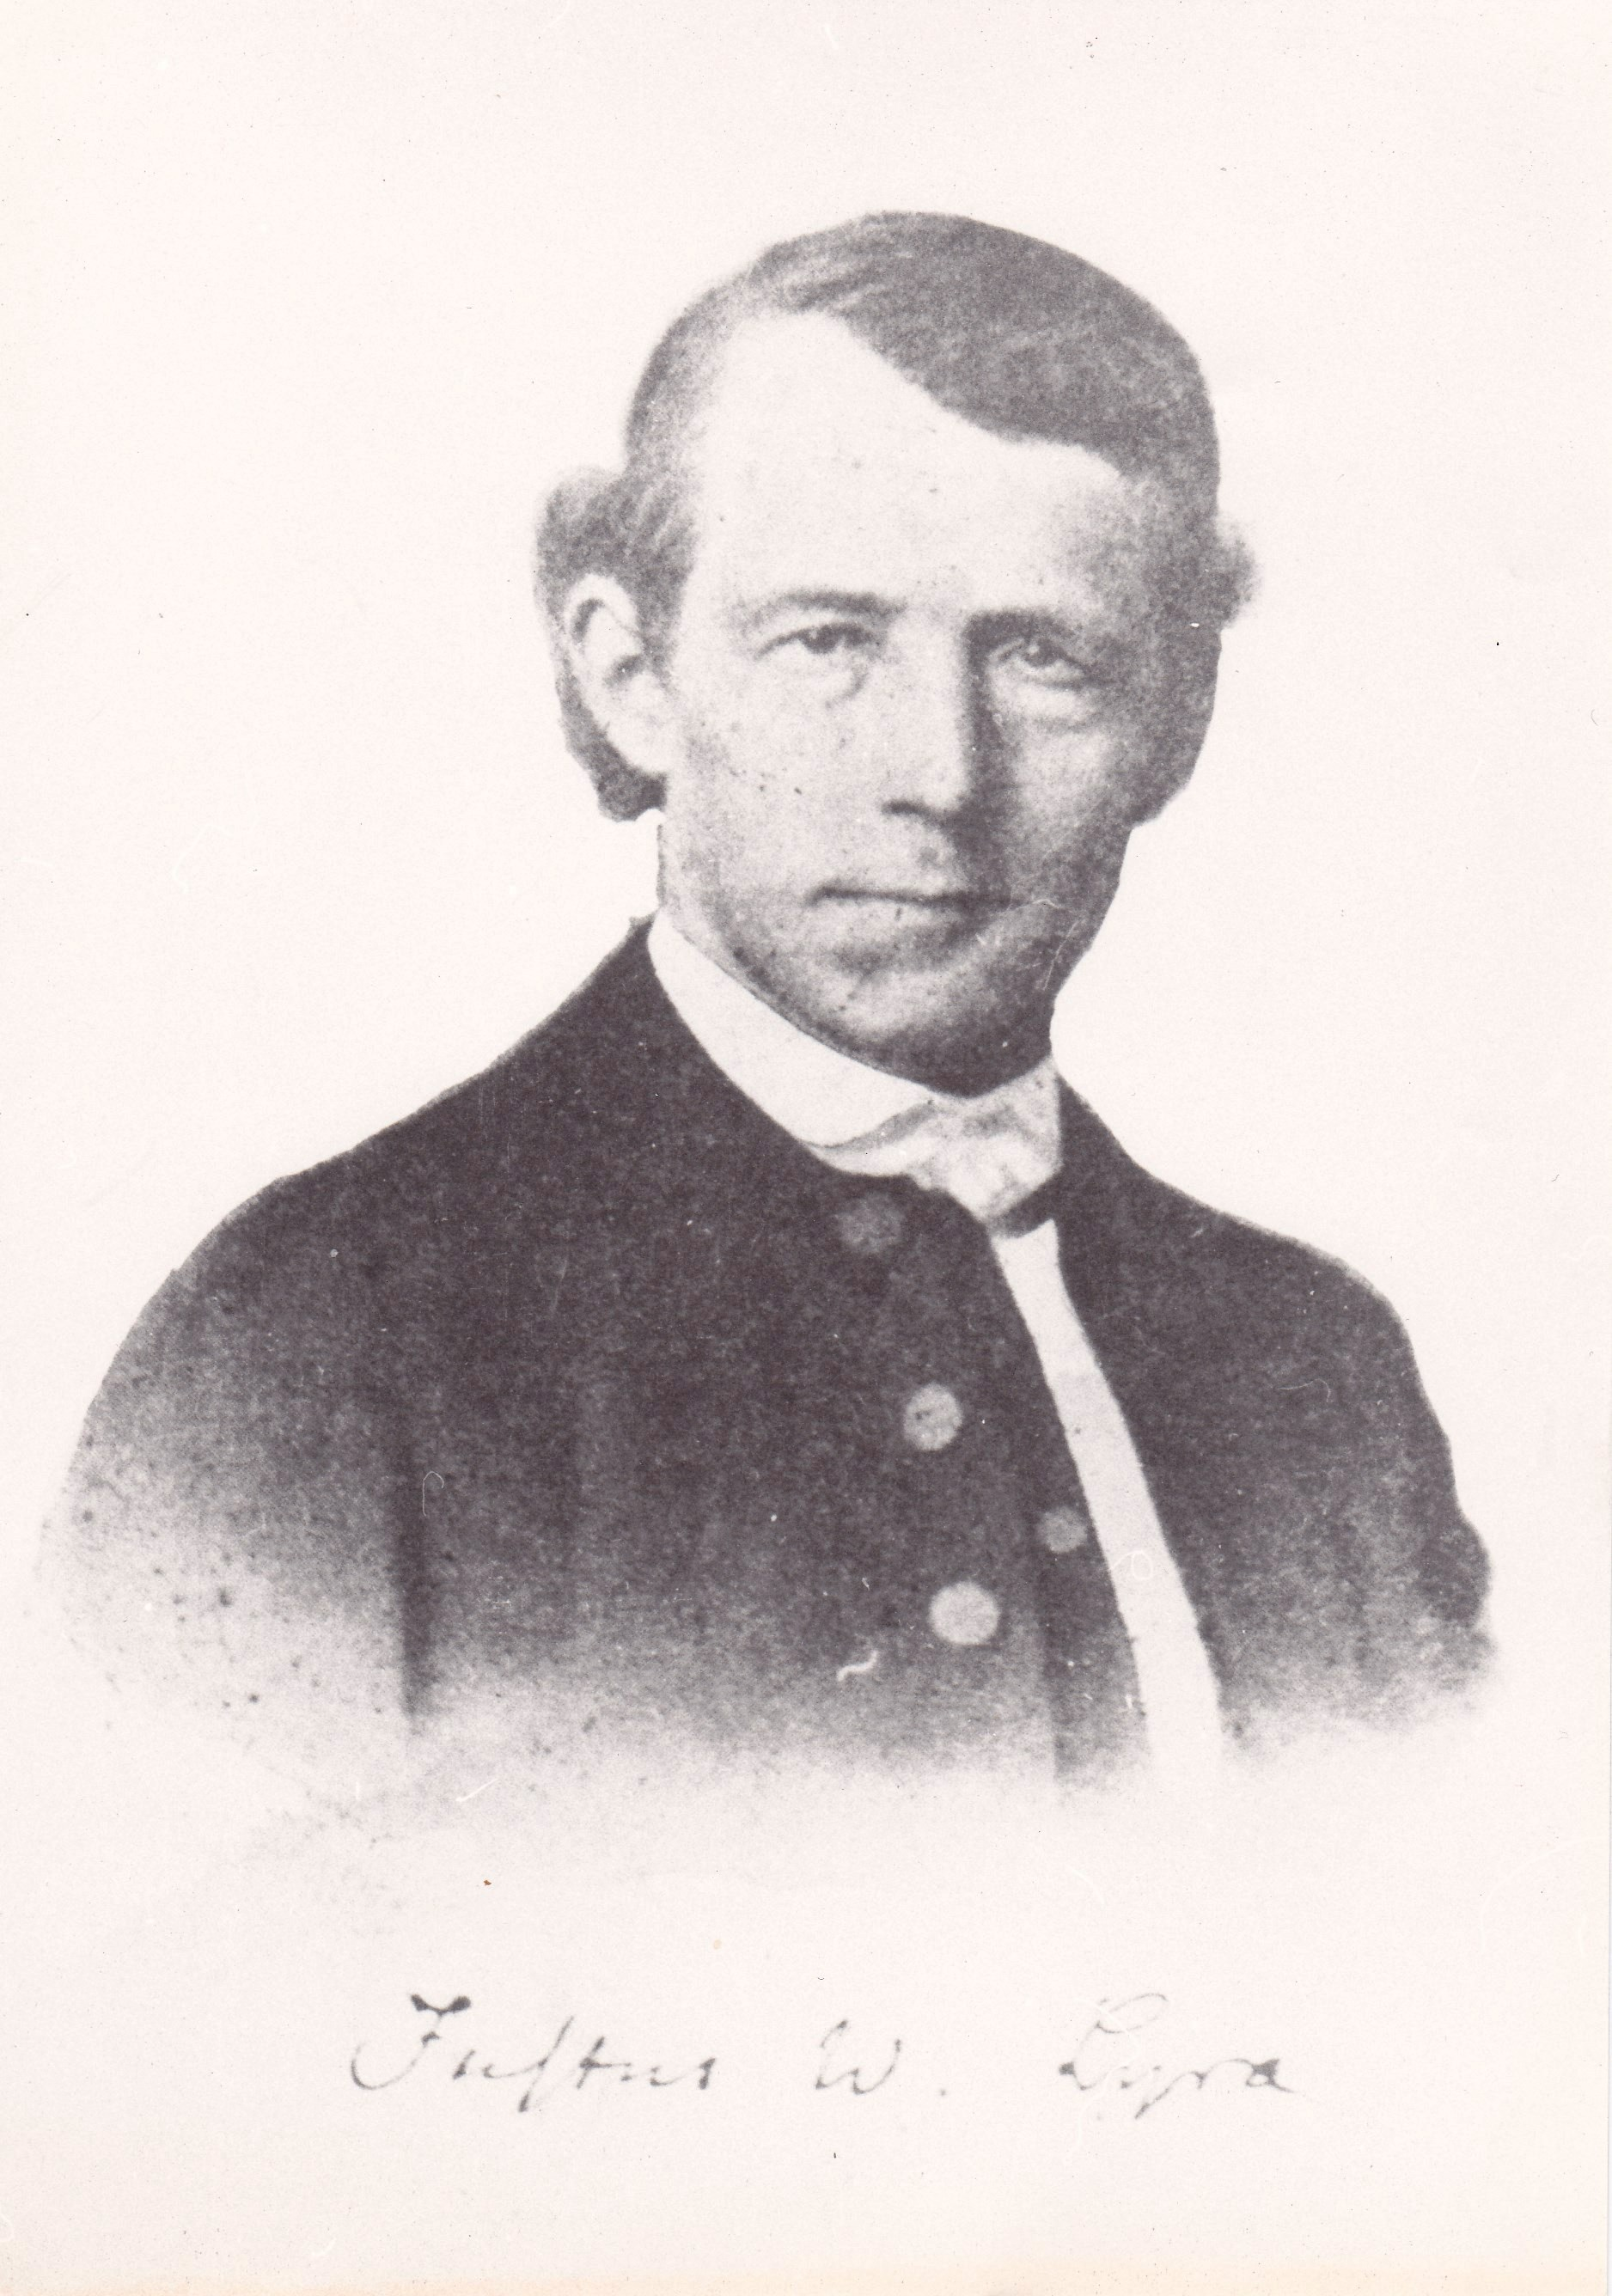 Justus Wilhelm Lyra